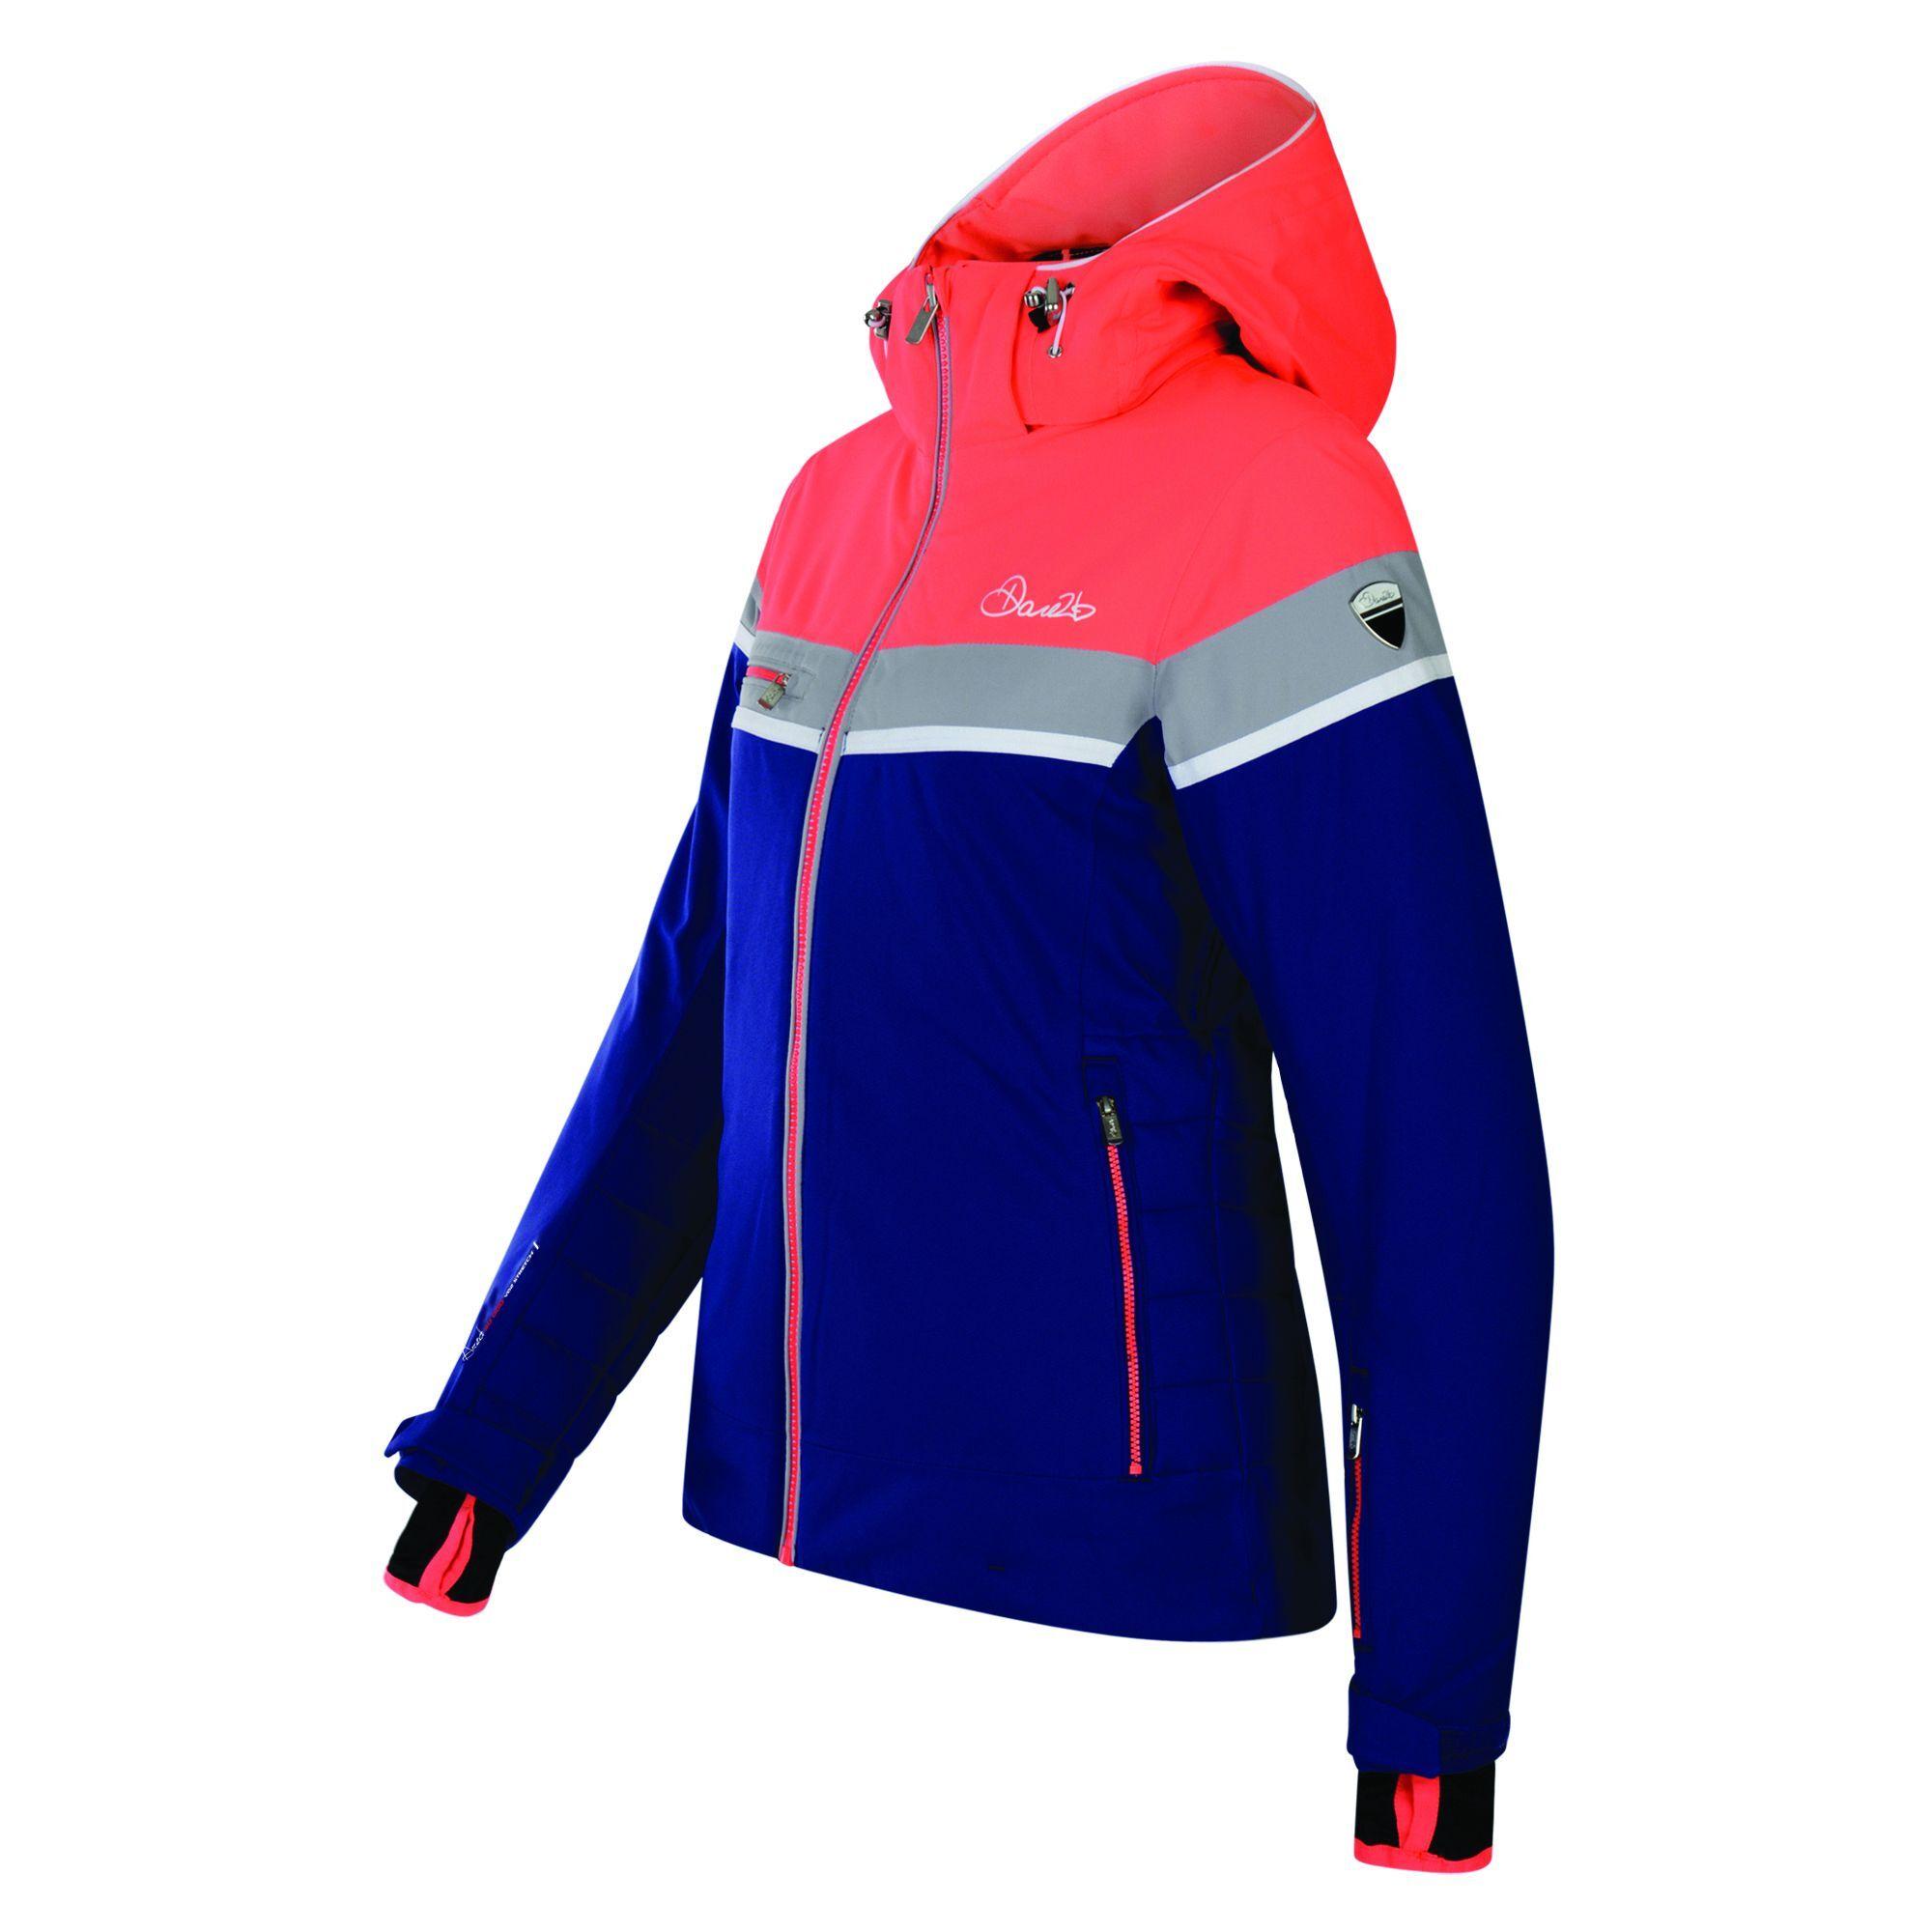 Dare 2B - Manteau De Ski Premiss - Femme (Bleu / orange) - UTRG3144